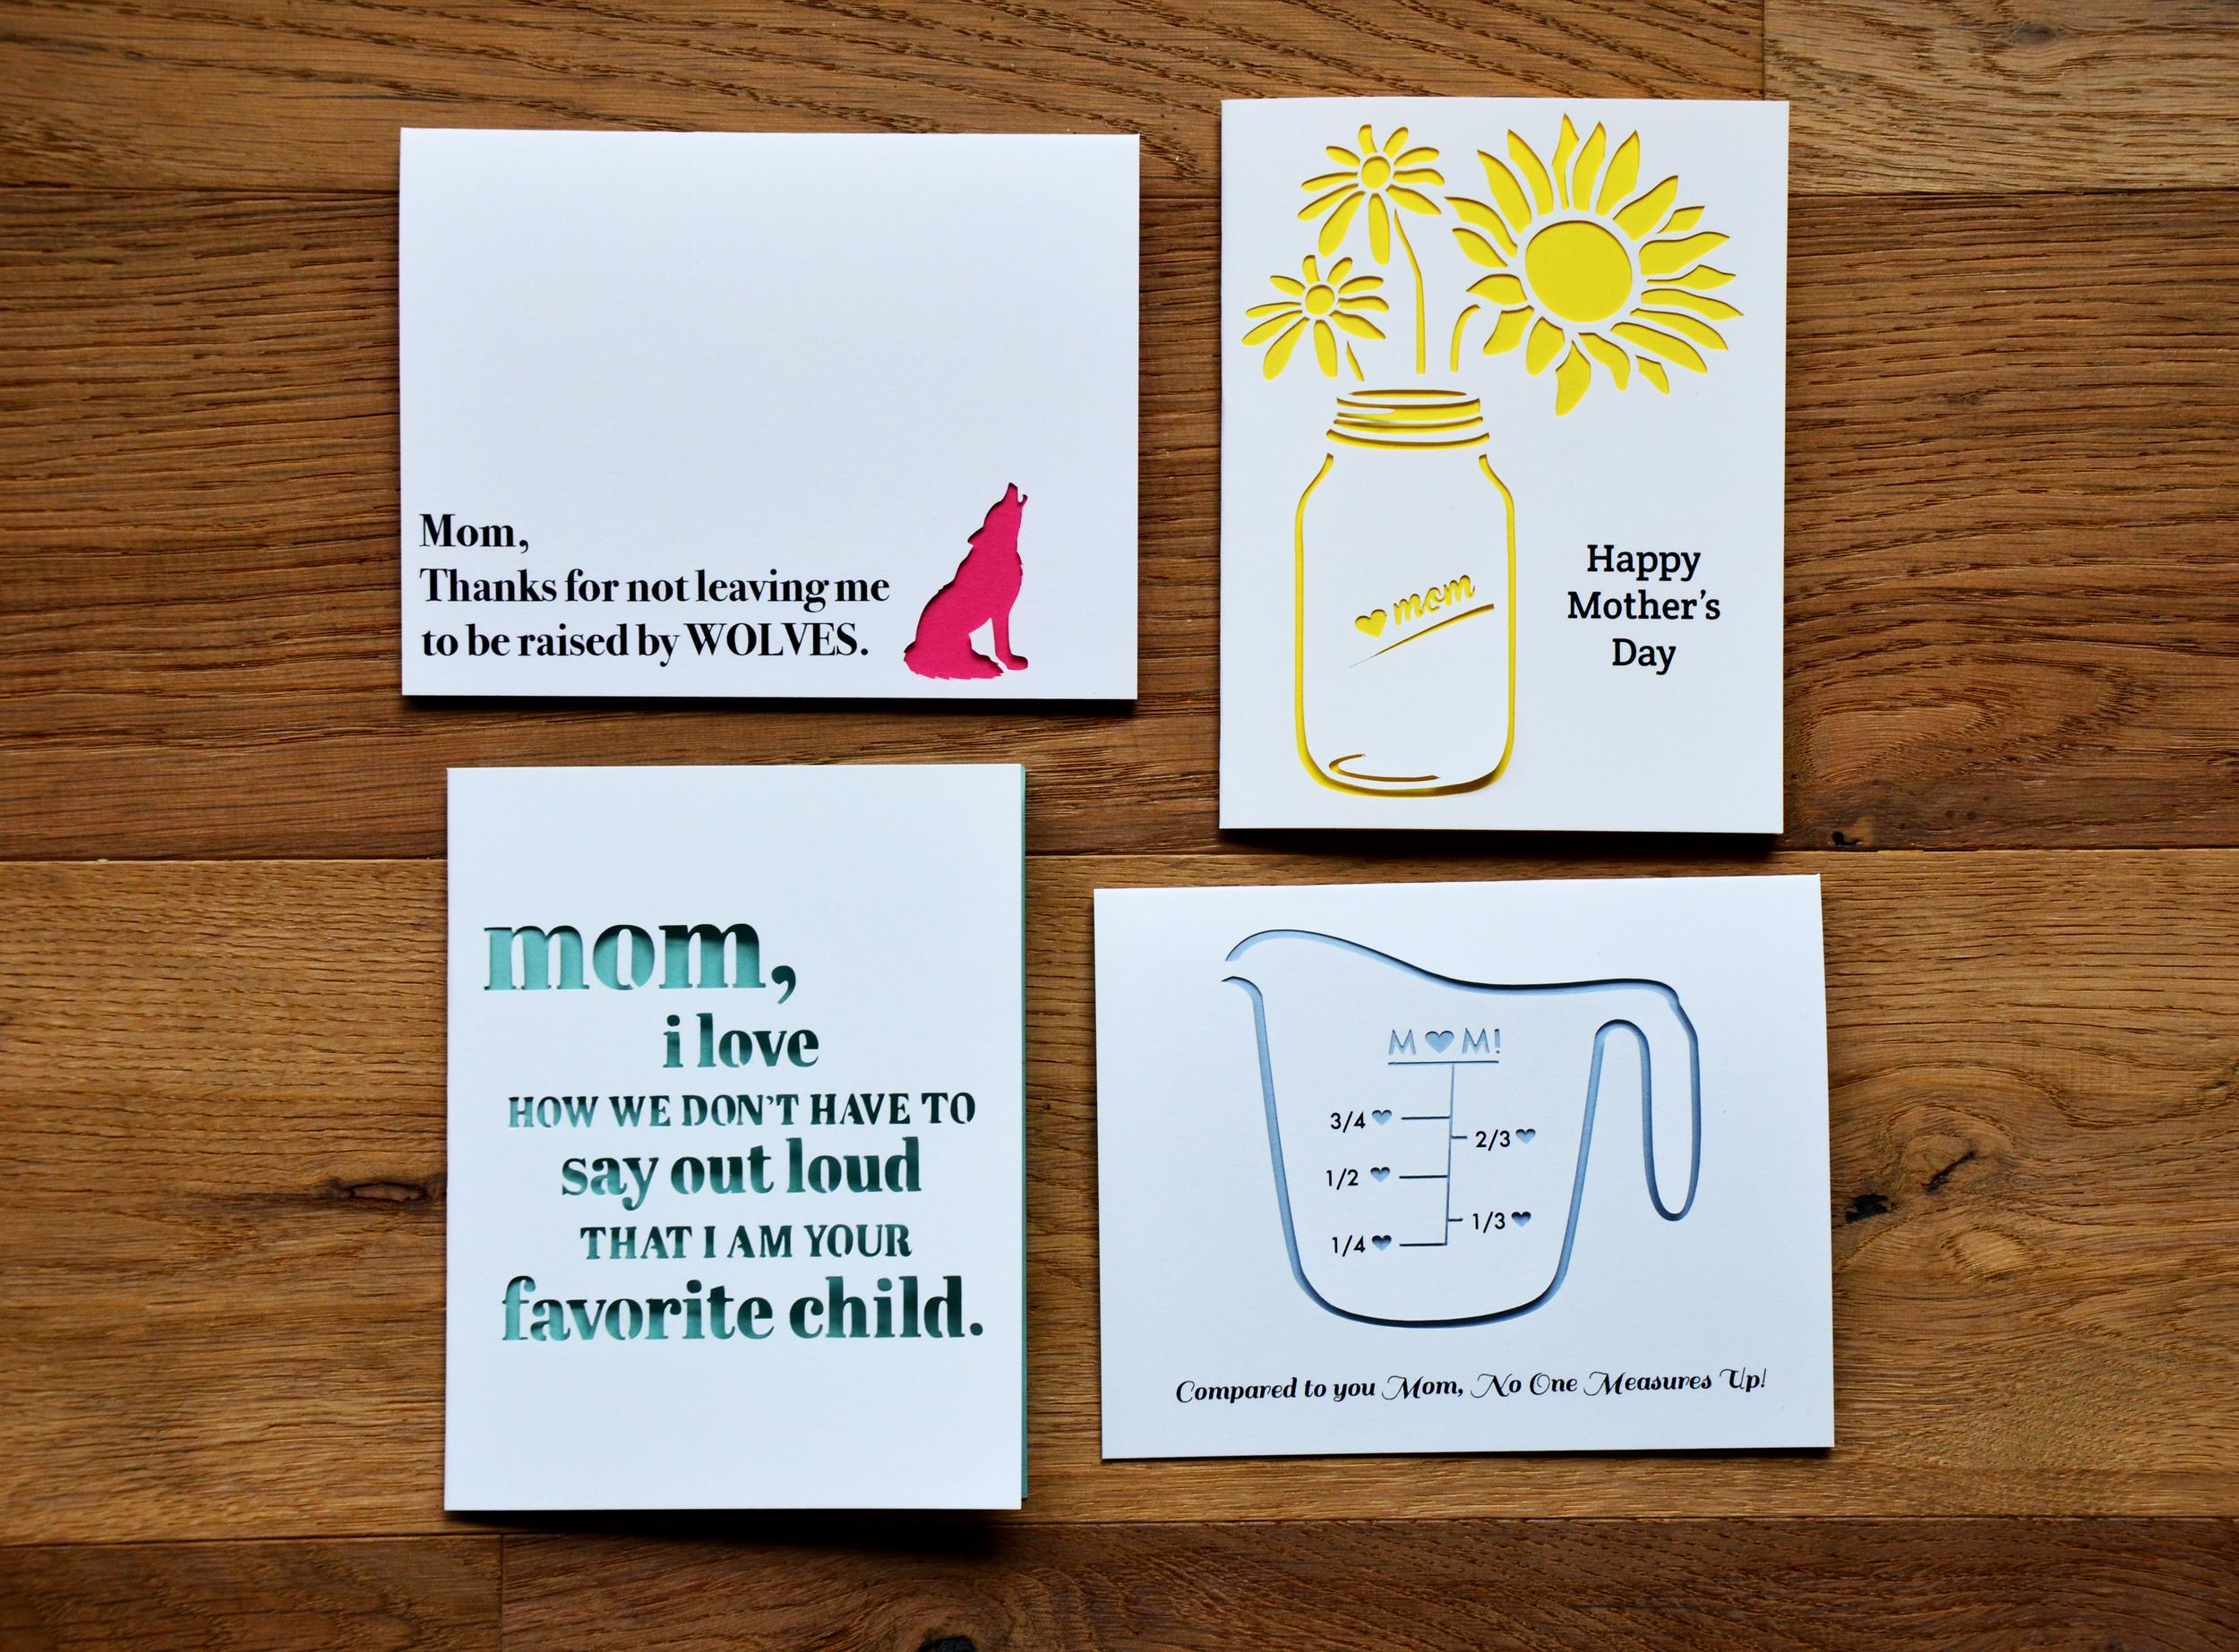 MothersDayGroup1.jpg